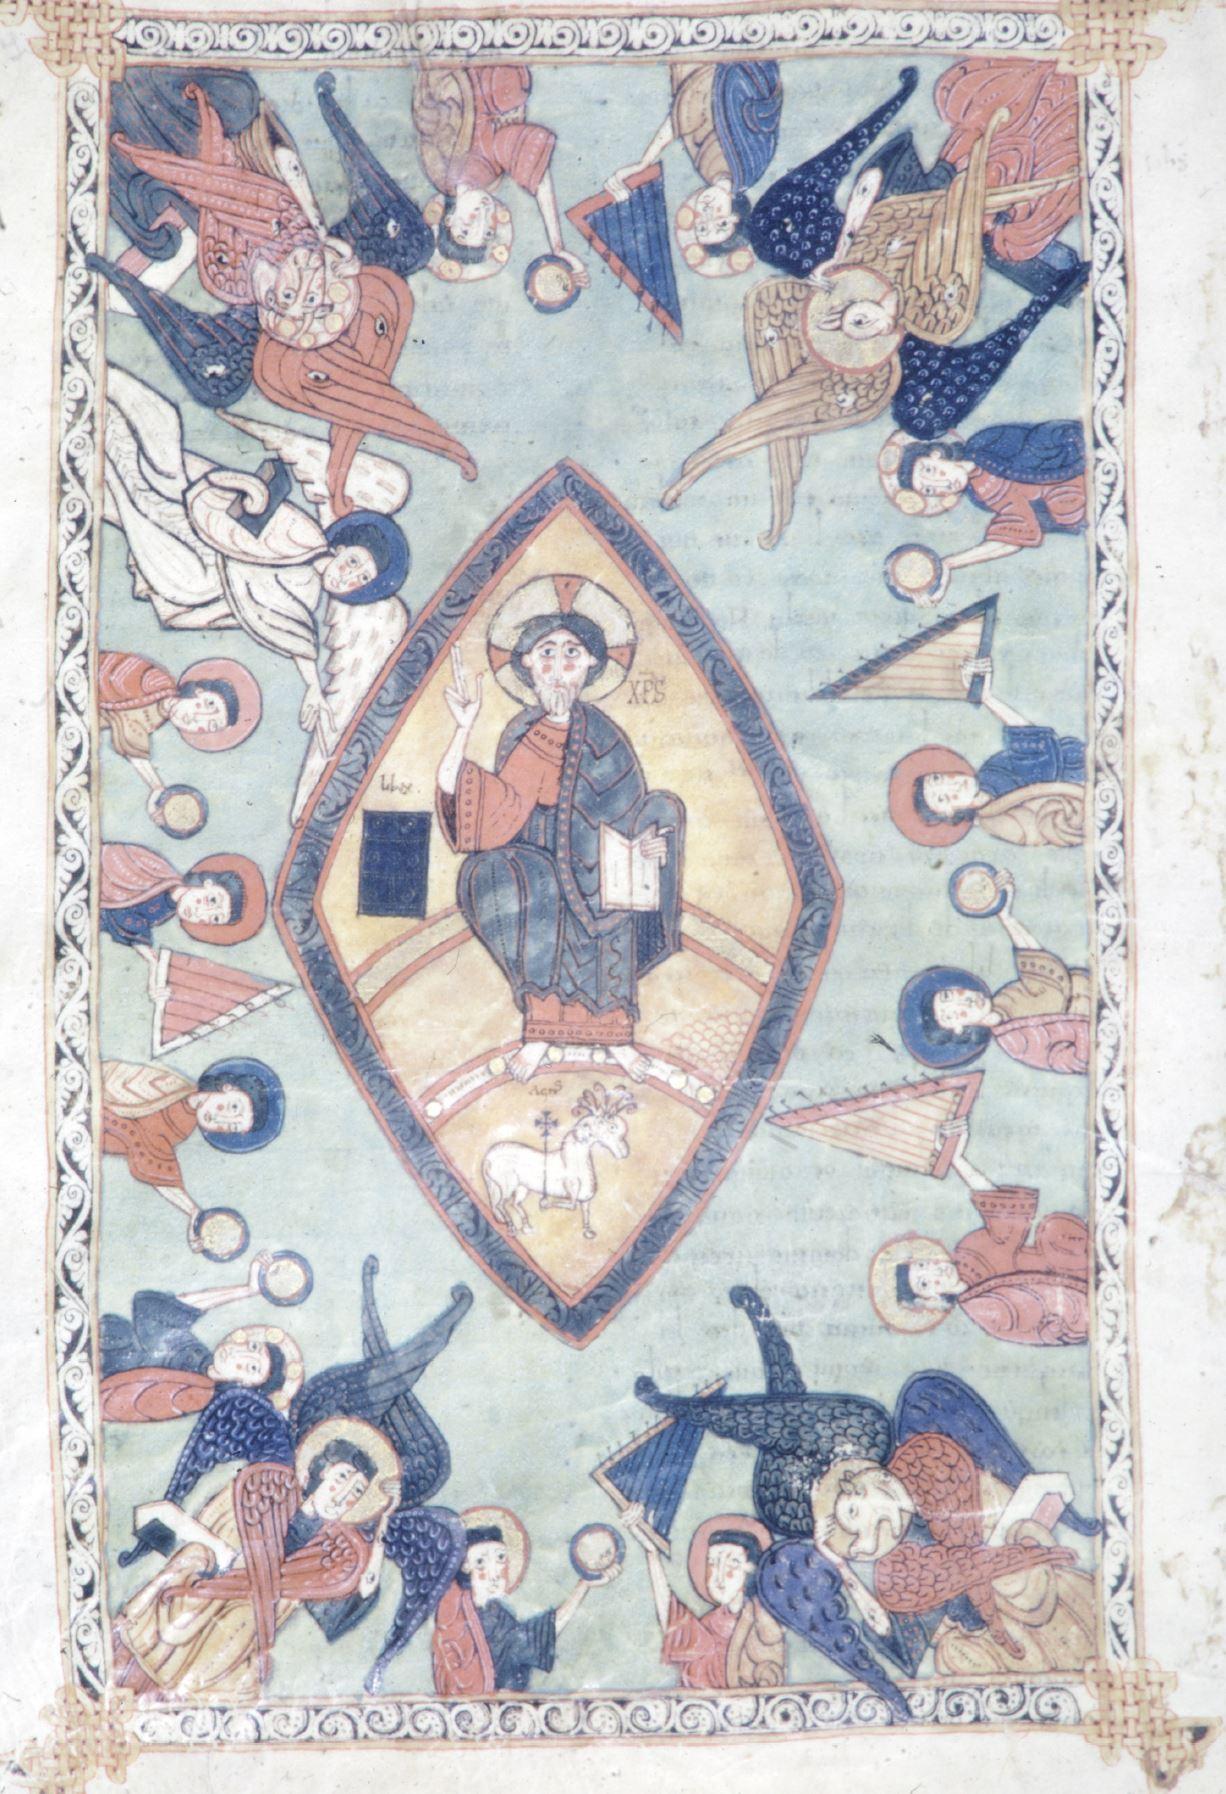 Beatus d'Osma 1086 Apocalypse 2-4 synoptique Burgo de Osma, Archivo de la Catedral, Cod. 1